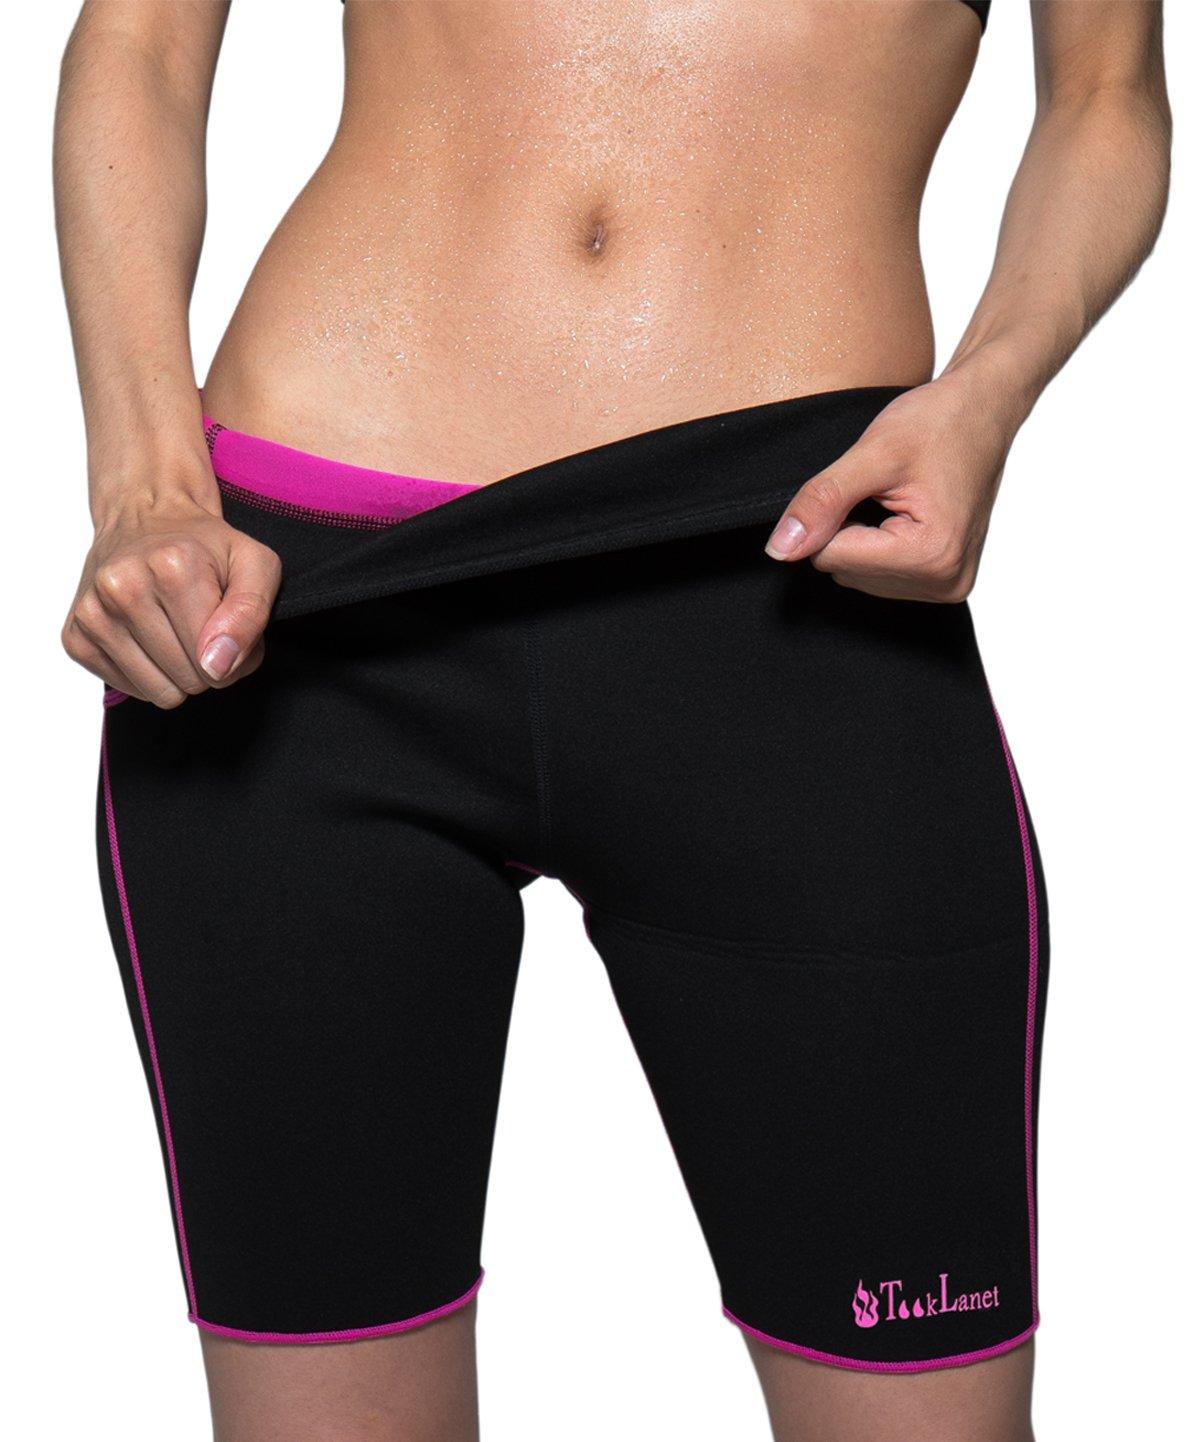 6750041481 Tooklanet Women s Slimming Short Pants Hot Thermo Sweat Sauna Neoprene Body  Shapers Weight Loss